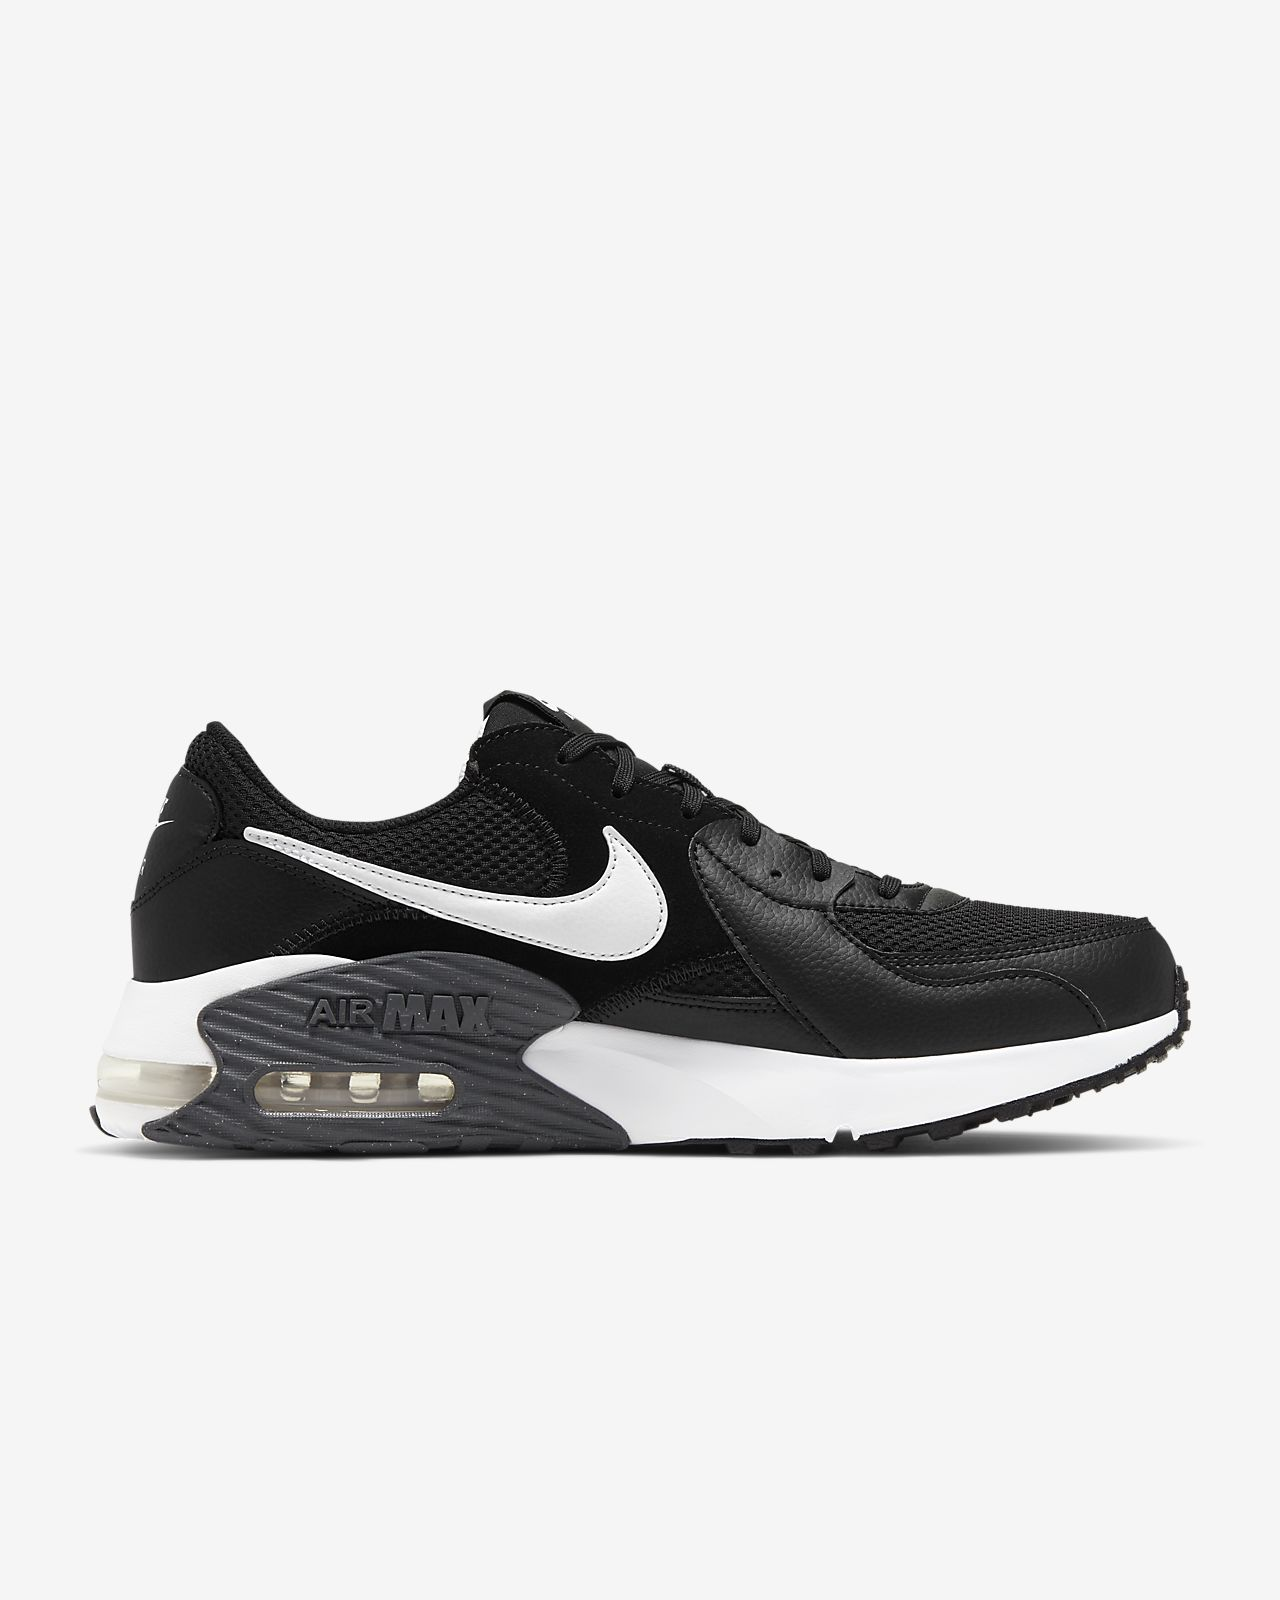 Nike Air Span II | AH6800 001 Grey Lifestyle Shoes